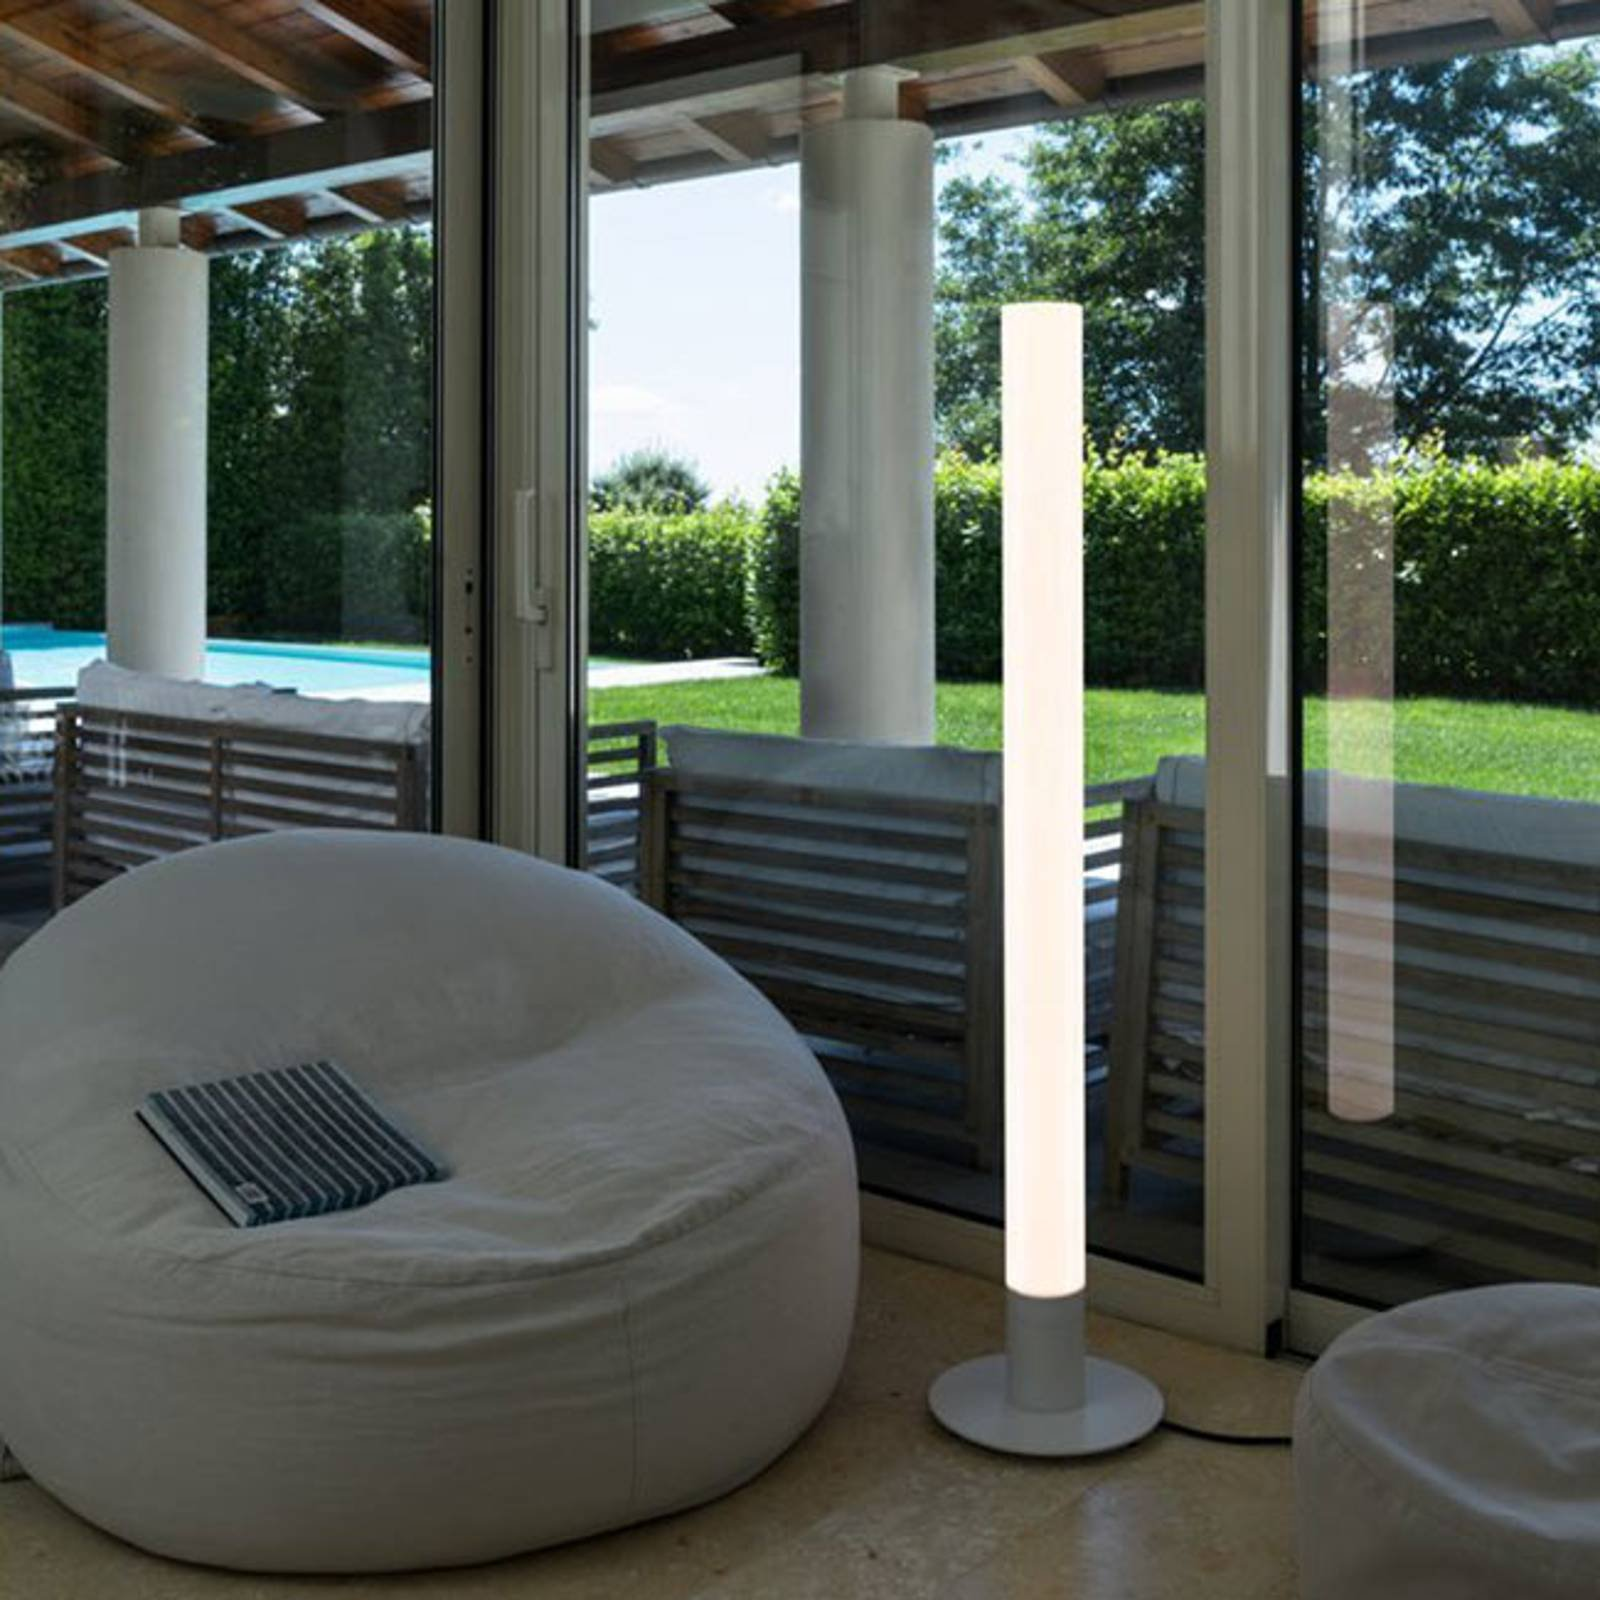 SLV Light Pipe LED-gulvlampe, dimbar, IP55, 140 cm